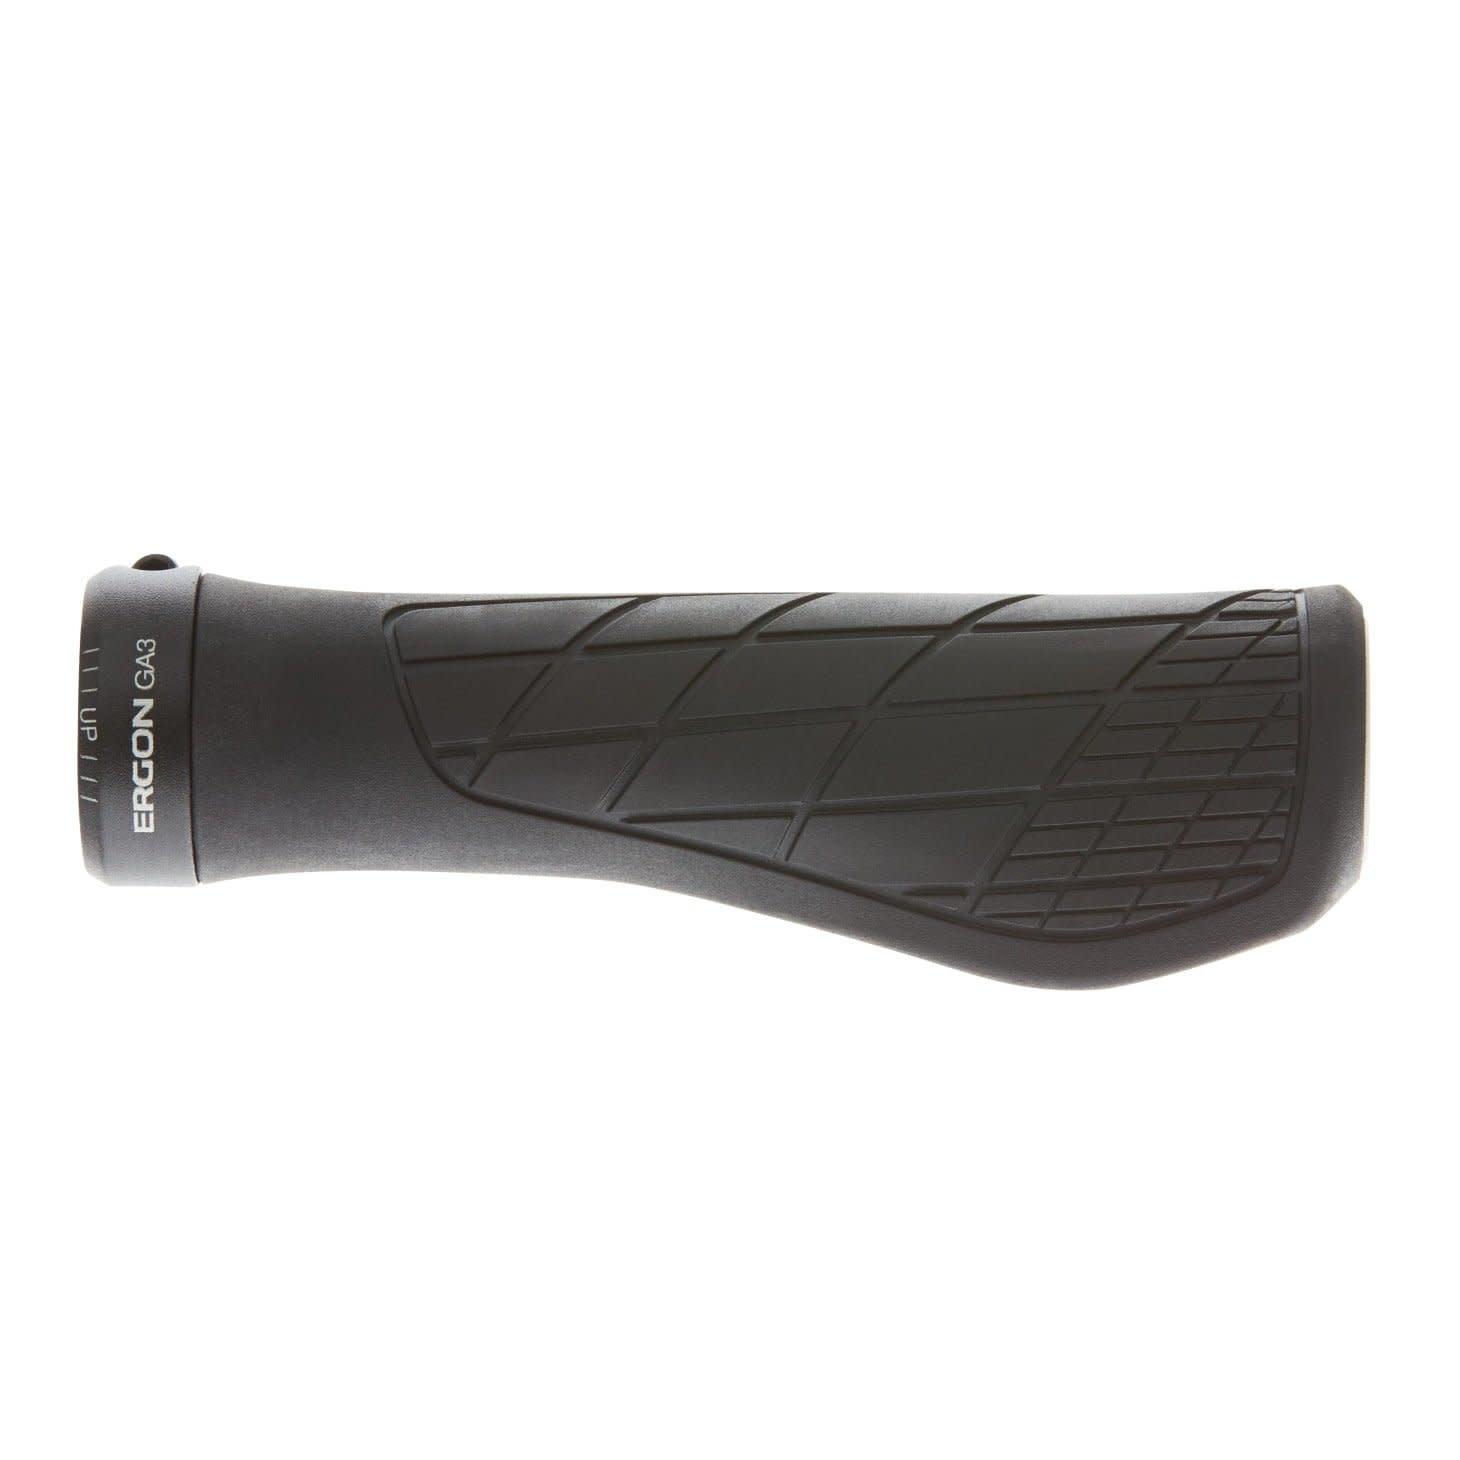 Ergon Ergon GA3-S Grips Black